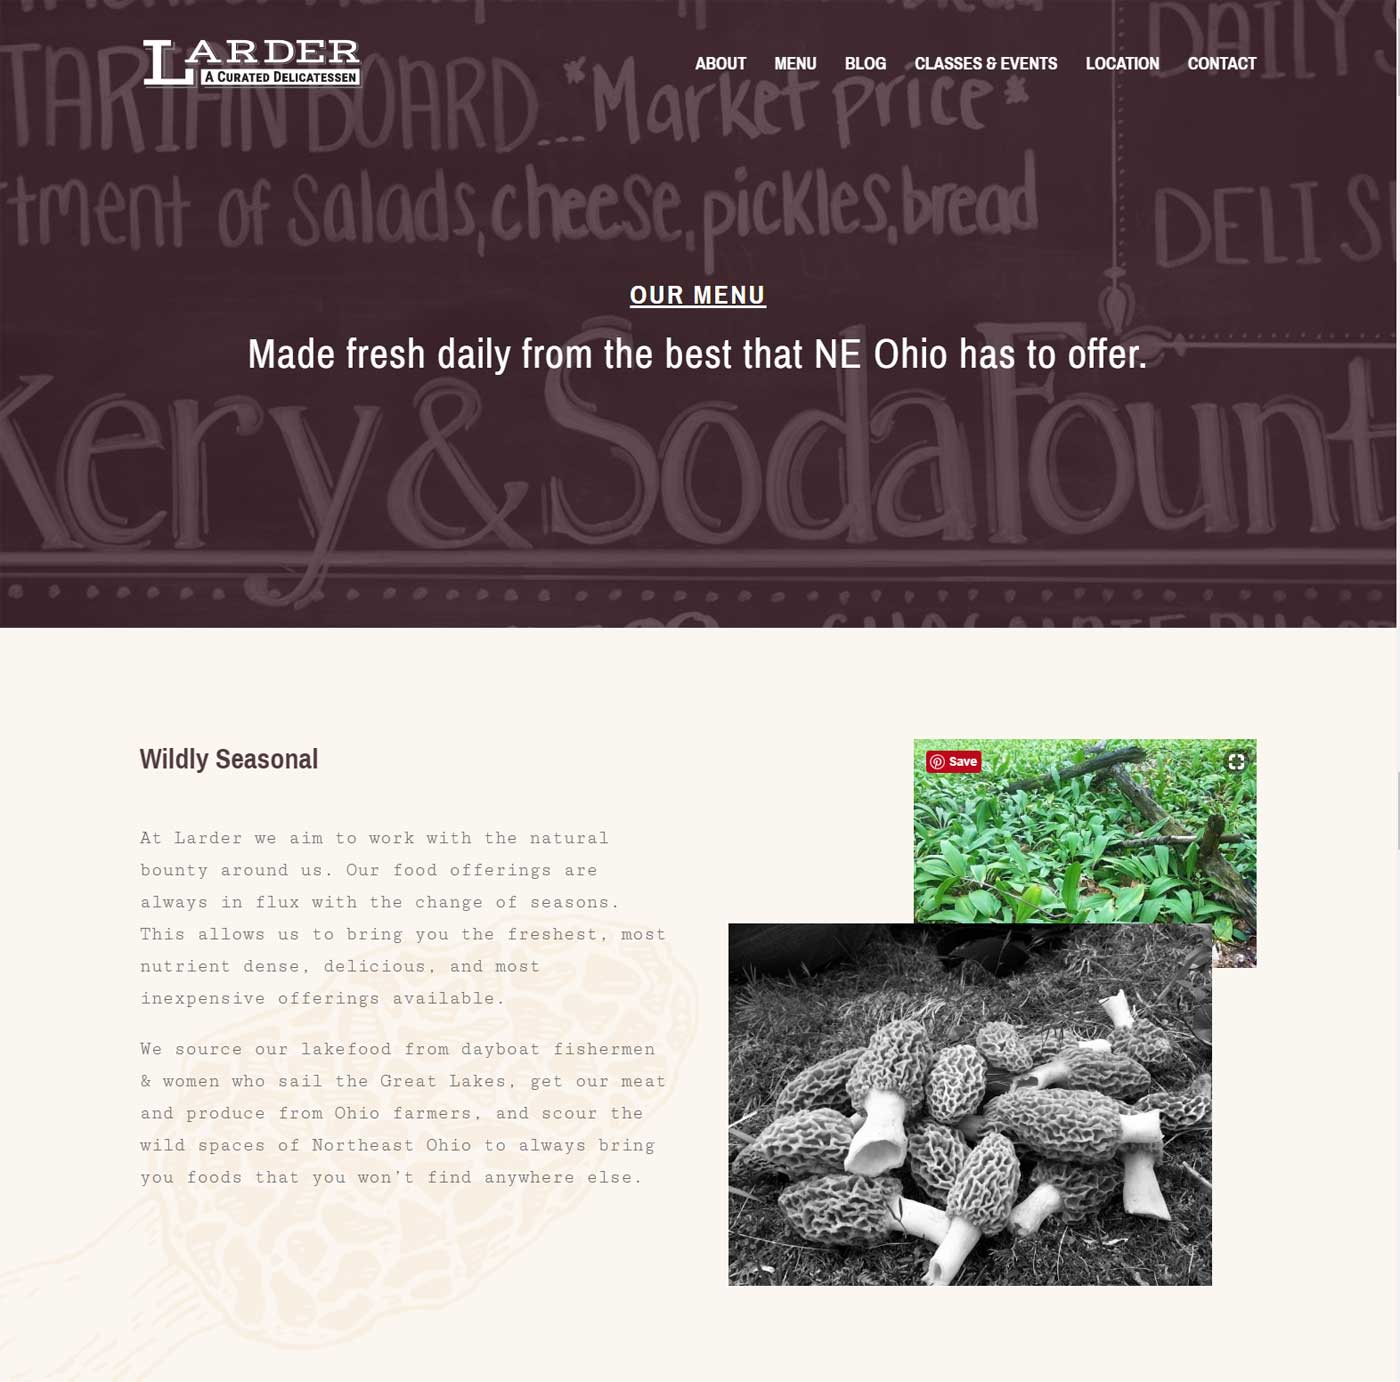 Larder Delicatessen and Bakery menu page